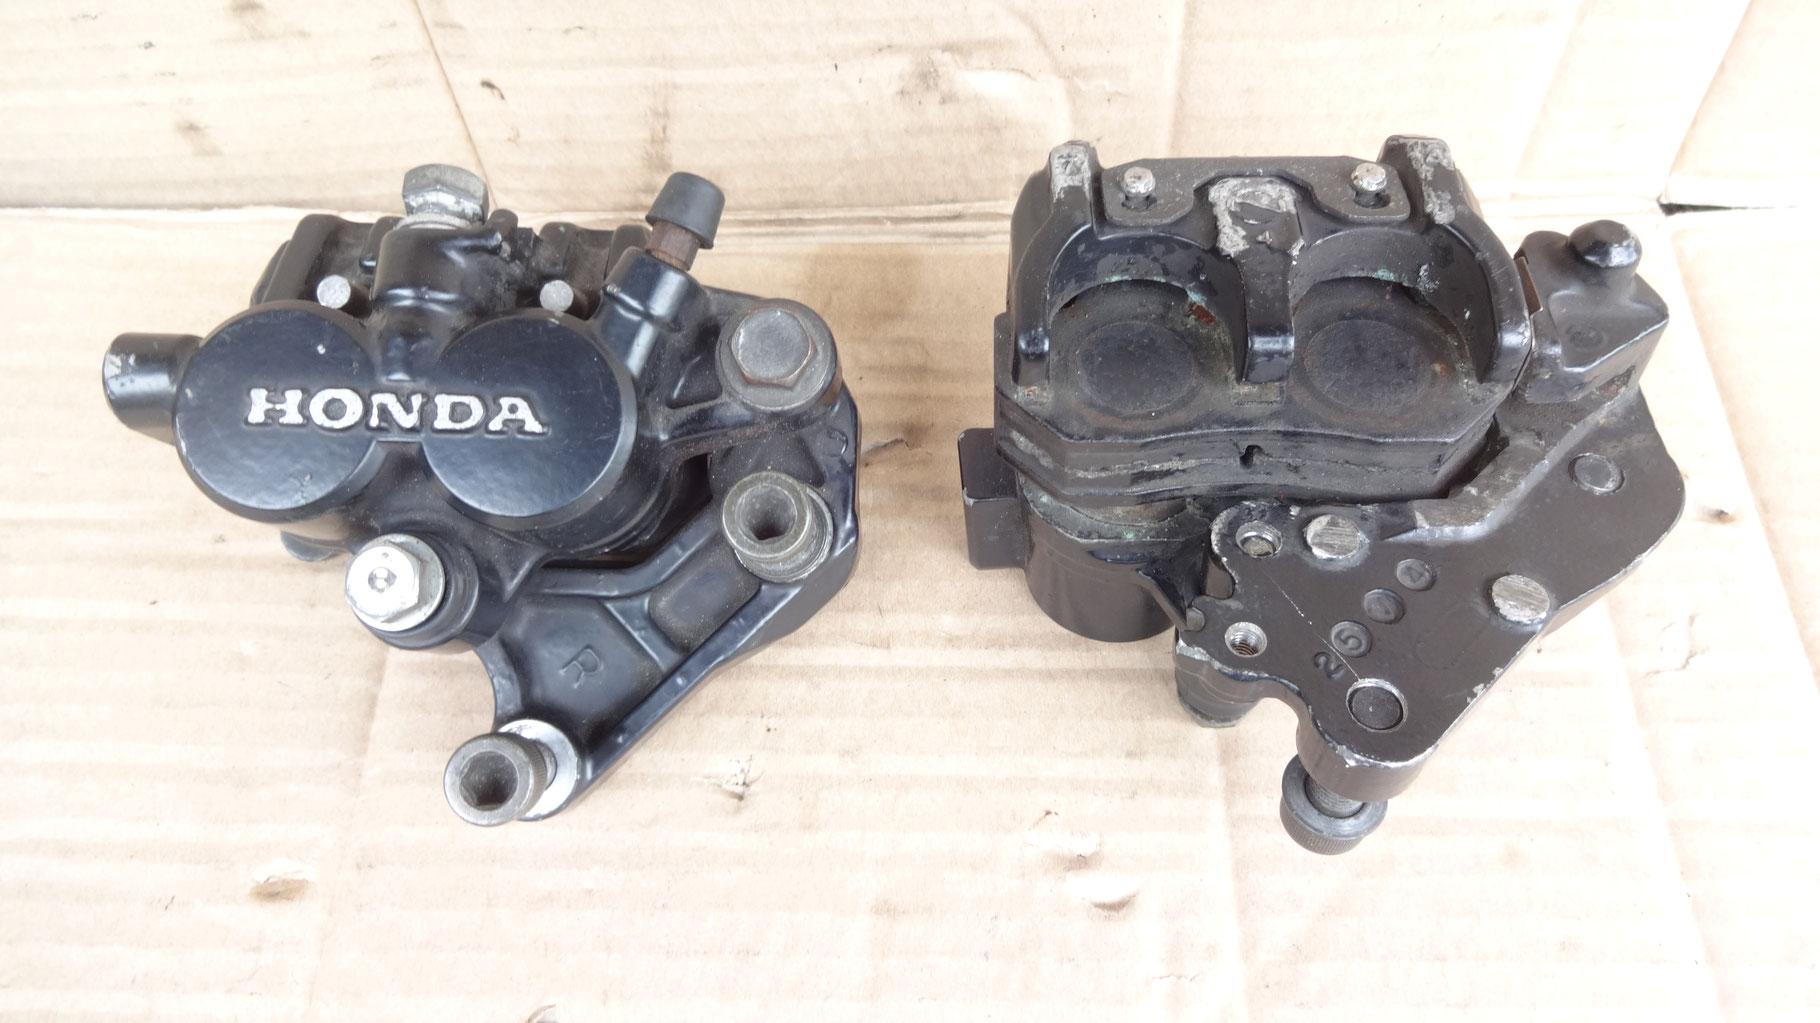 Honda CB 900 F Boldor 81-82 Bremssattel Reparatursatz Bremse hinten original